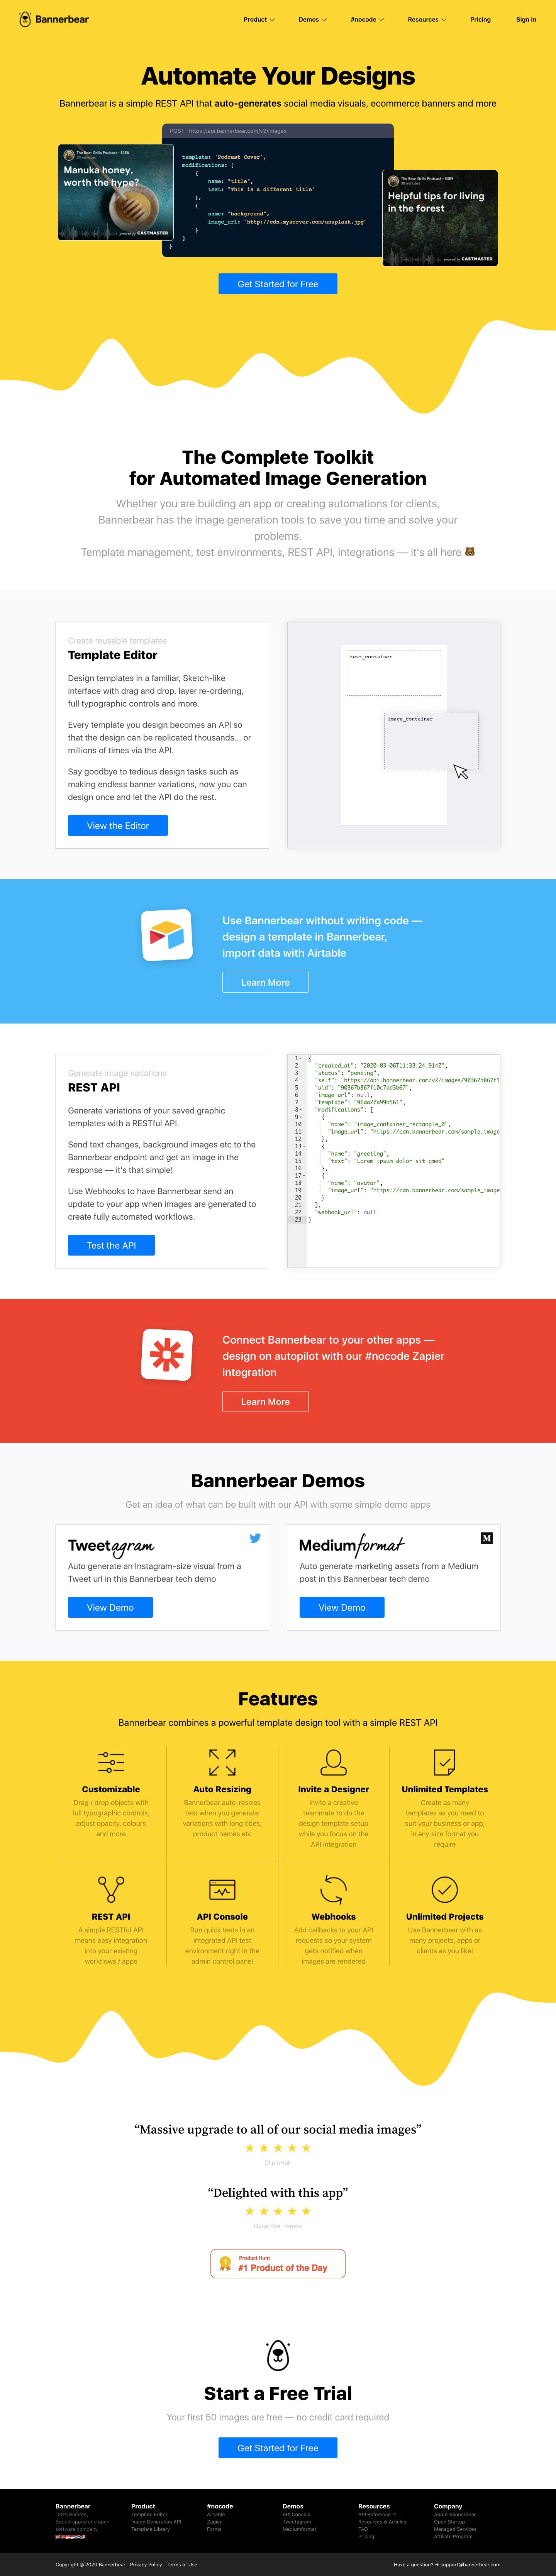 Bannerbear Landing Page